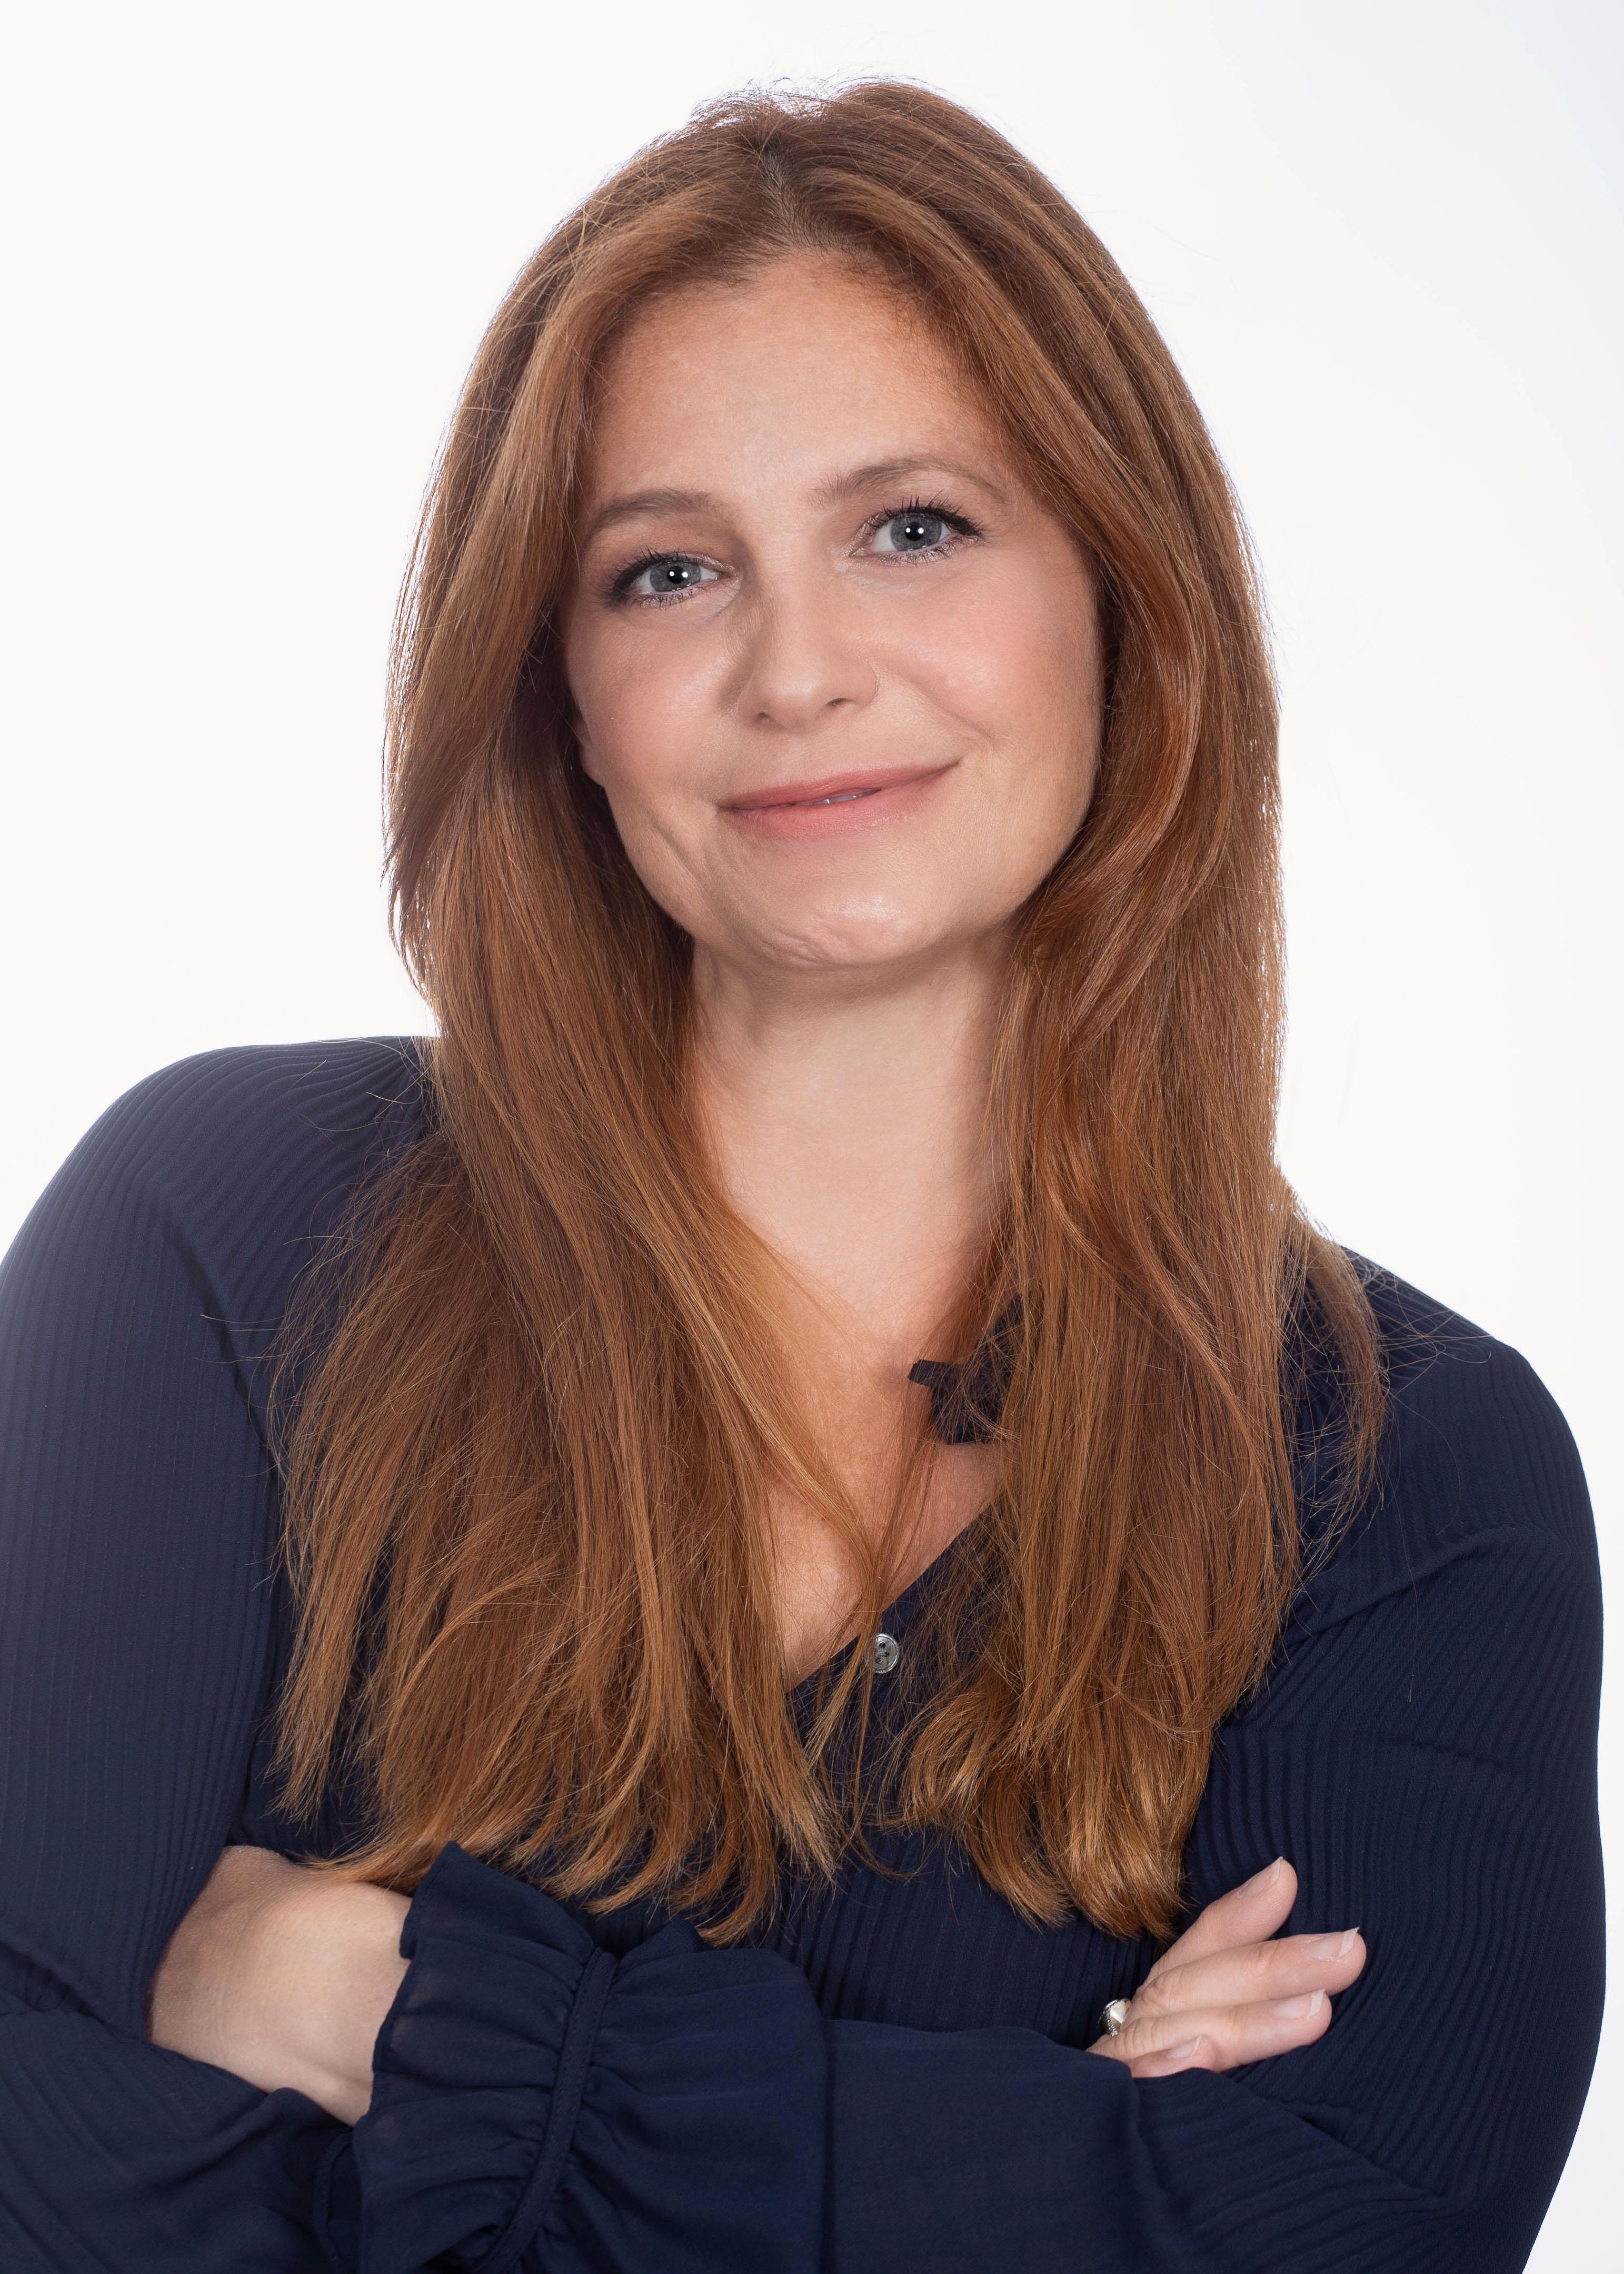 Jennifer Blake, The Ferrara Team at Keller Williams, Queens Real Estate Agent